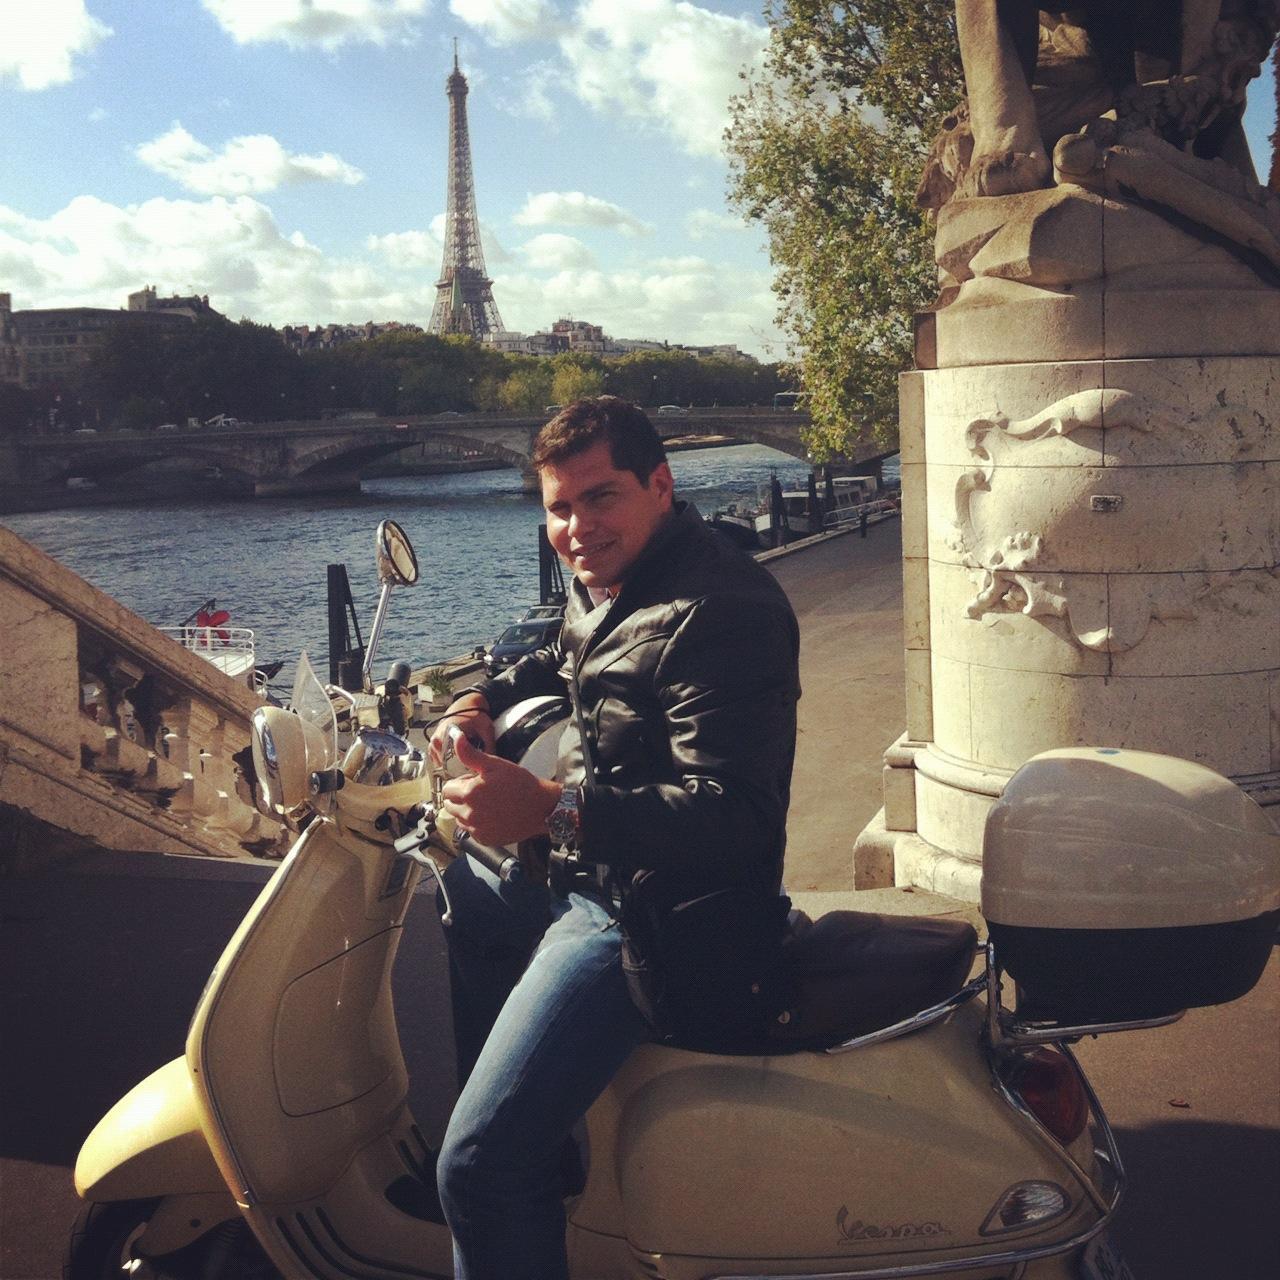 Eiffel tower on the Alexander III bridge - Pictures of Paris France -